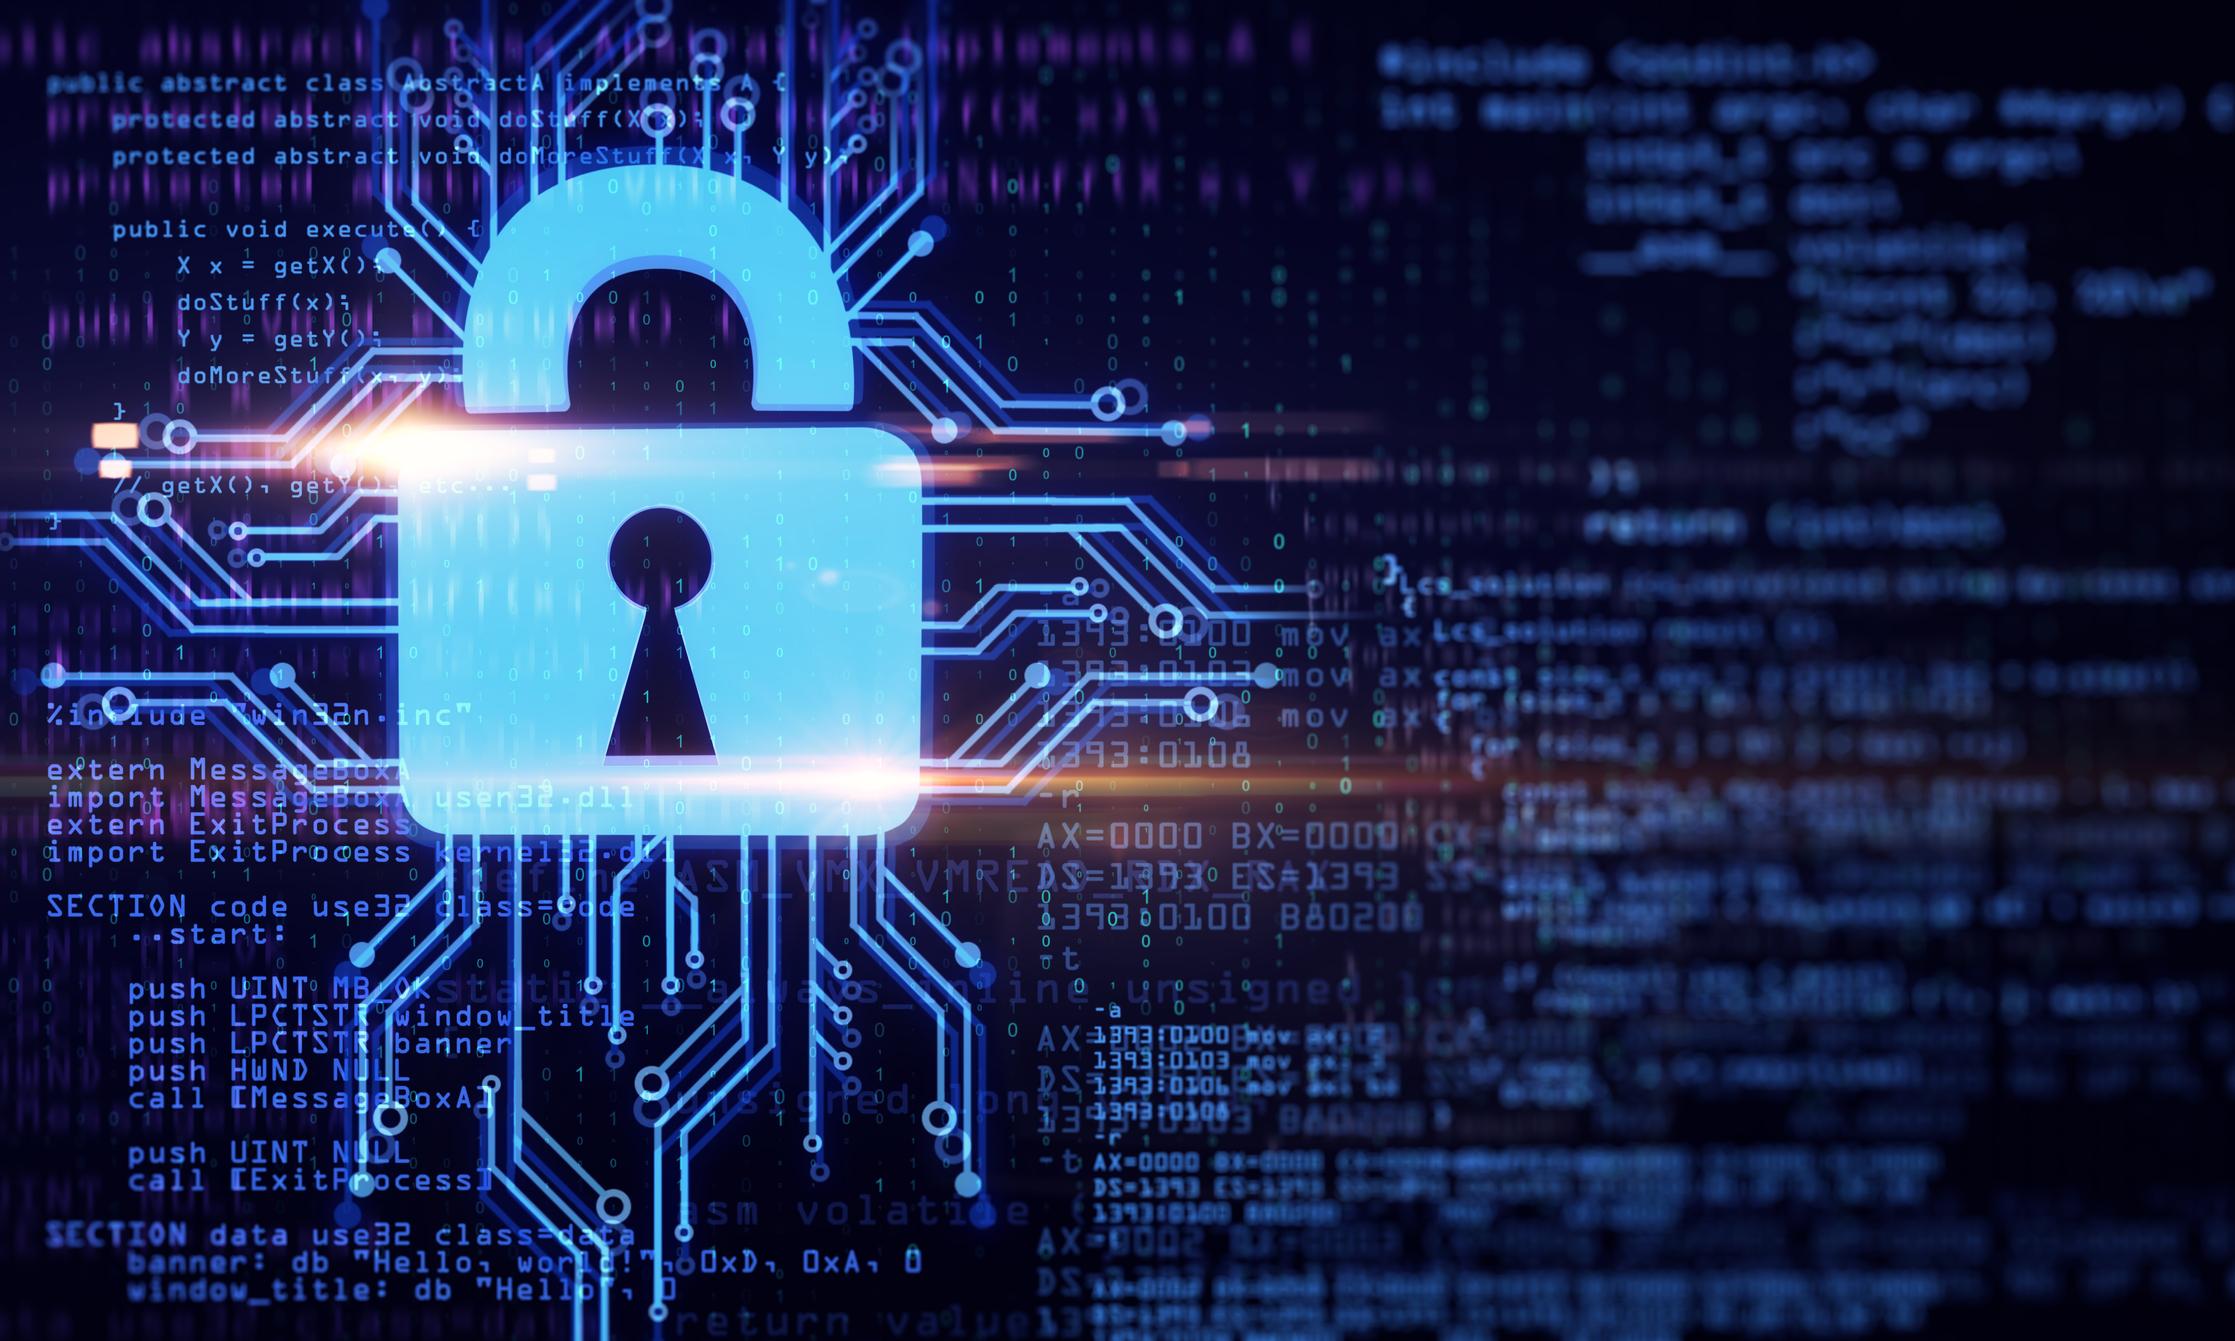 Cybersecurity icon. Image credit: iStock